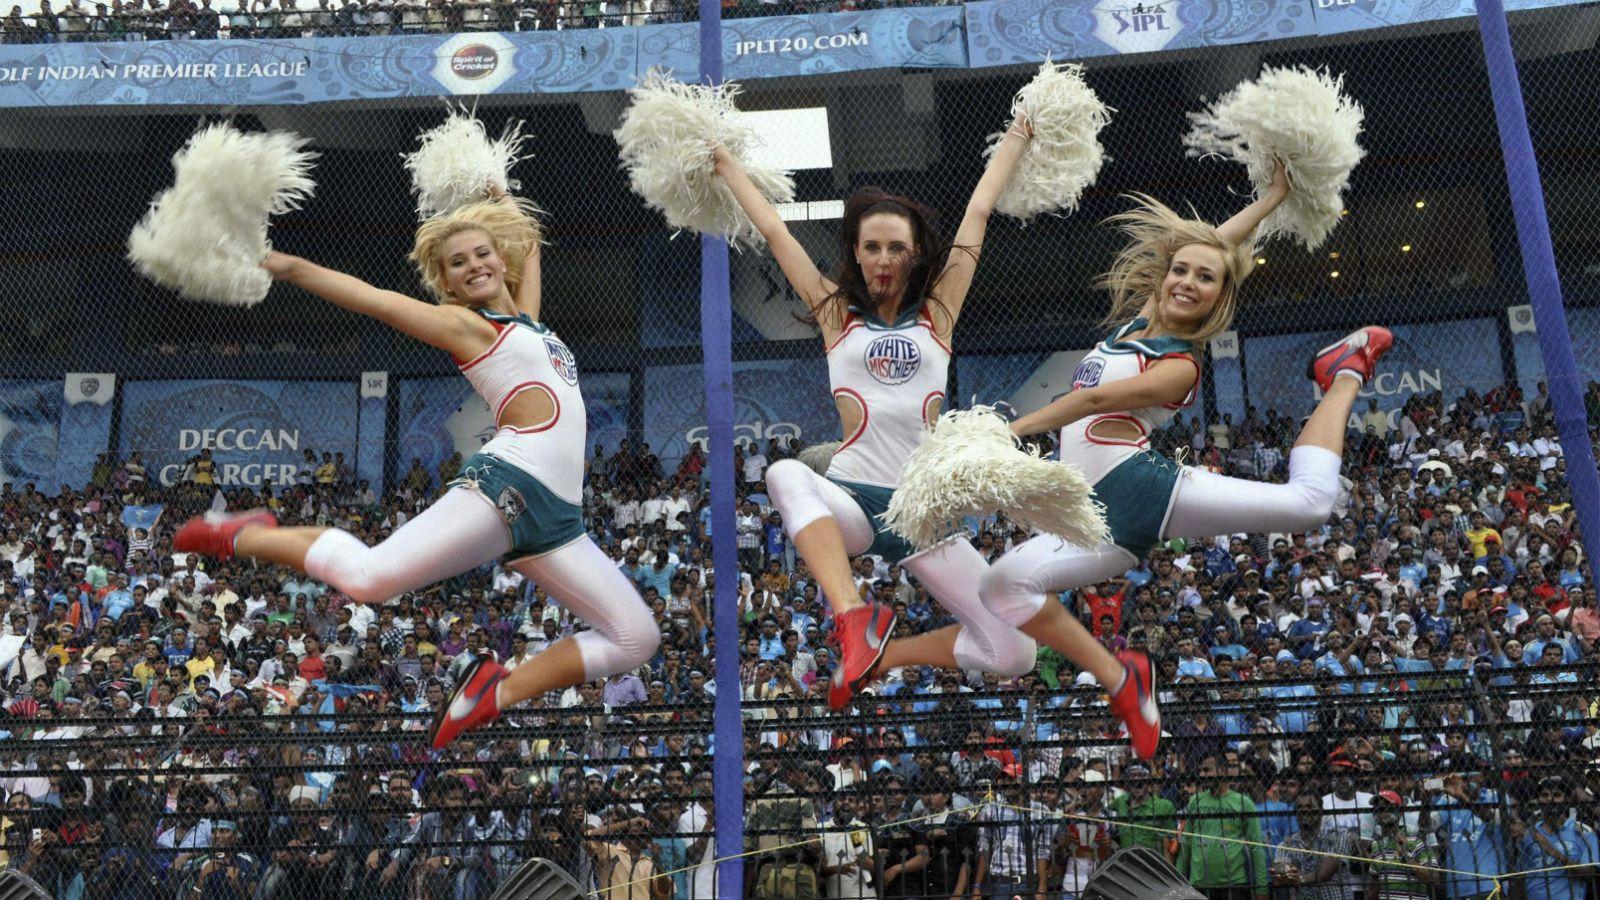 India-America-IPL-Cricket